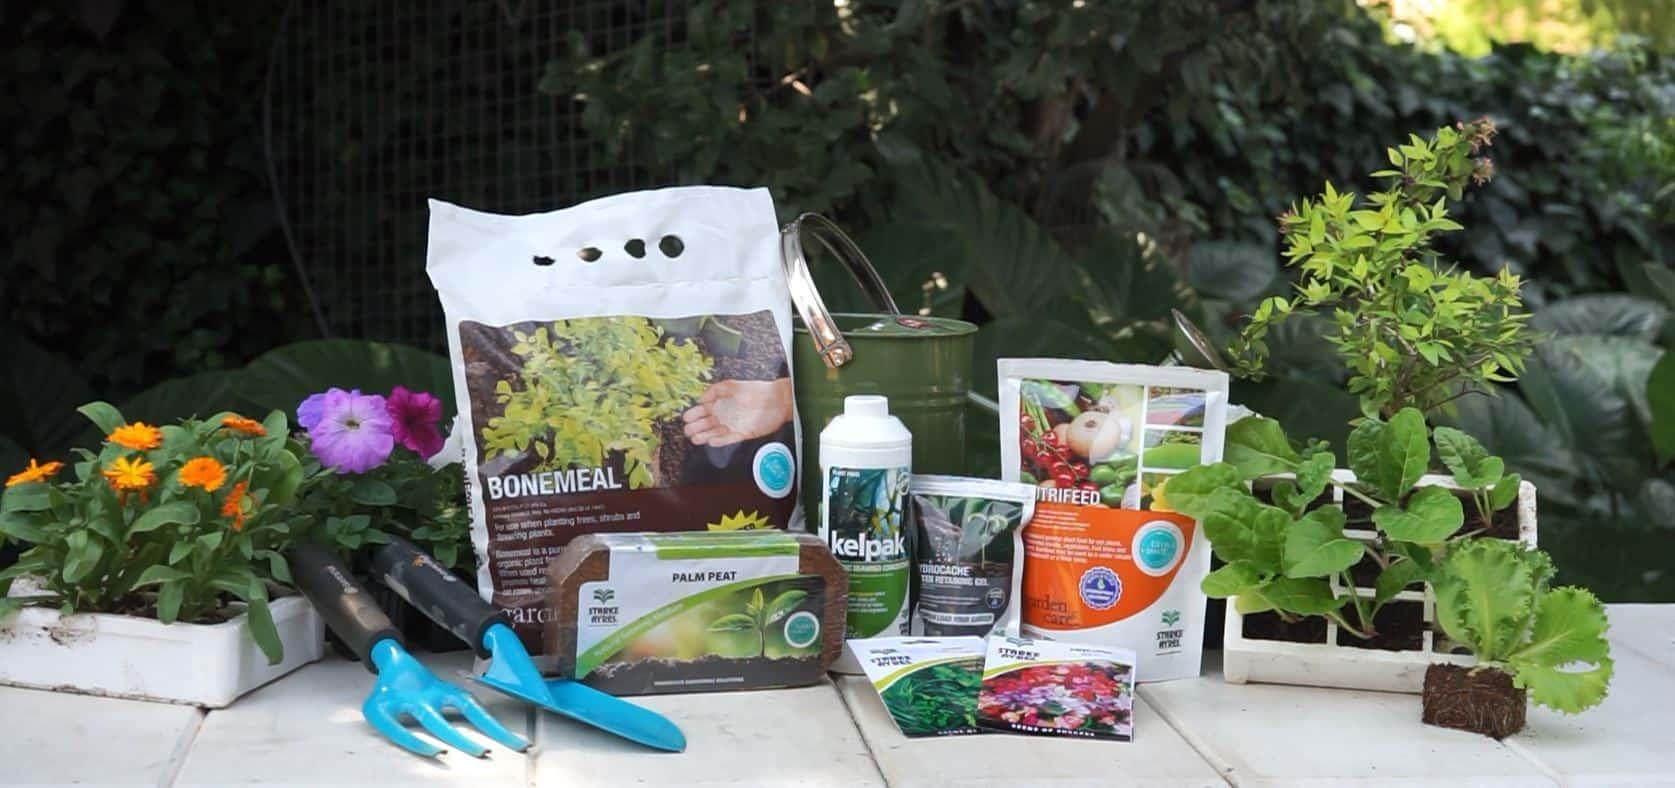 starke ayres lifestyle home garden supplier quality seeds growing medium hydrocache hydroponics plennegy gardening gardens love growing south africa johannesburg gauteng